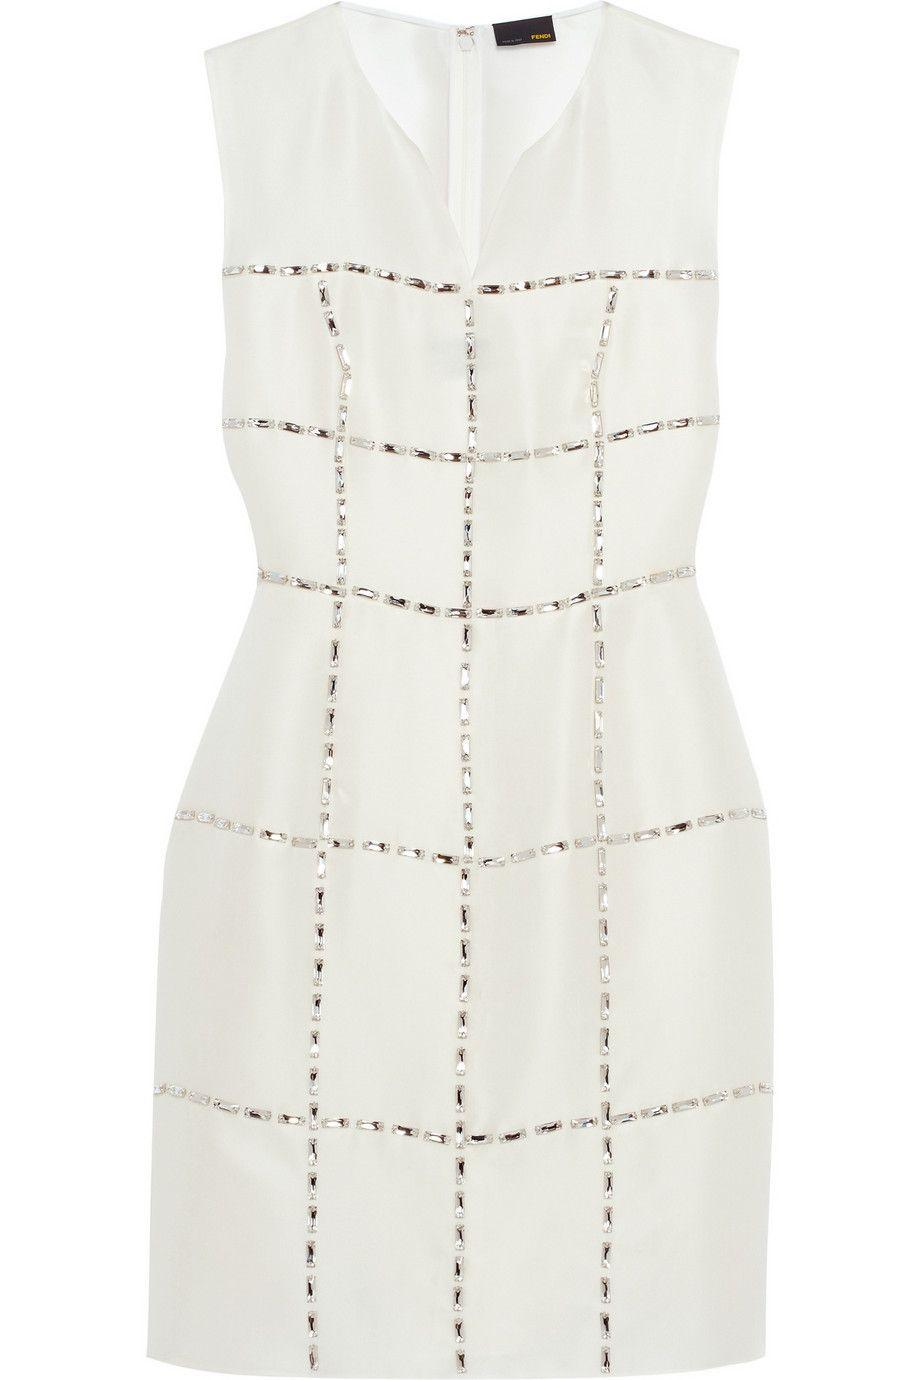 Fendi Swarovski Crystal Embellished Silk Gazar Dress Fendi Dress Dresses White Sheer Dress [ 1380 x 920 Pixel ]